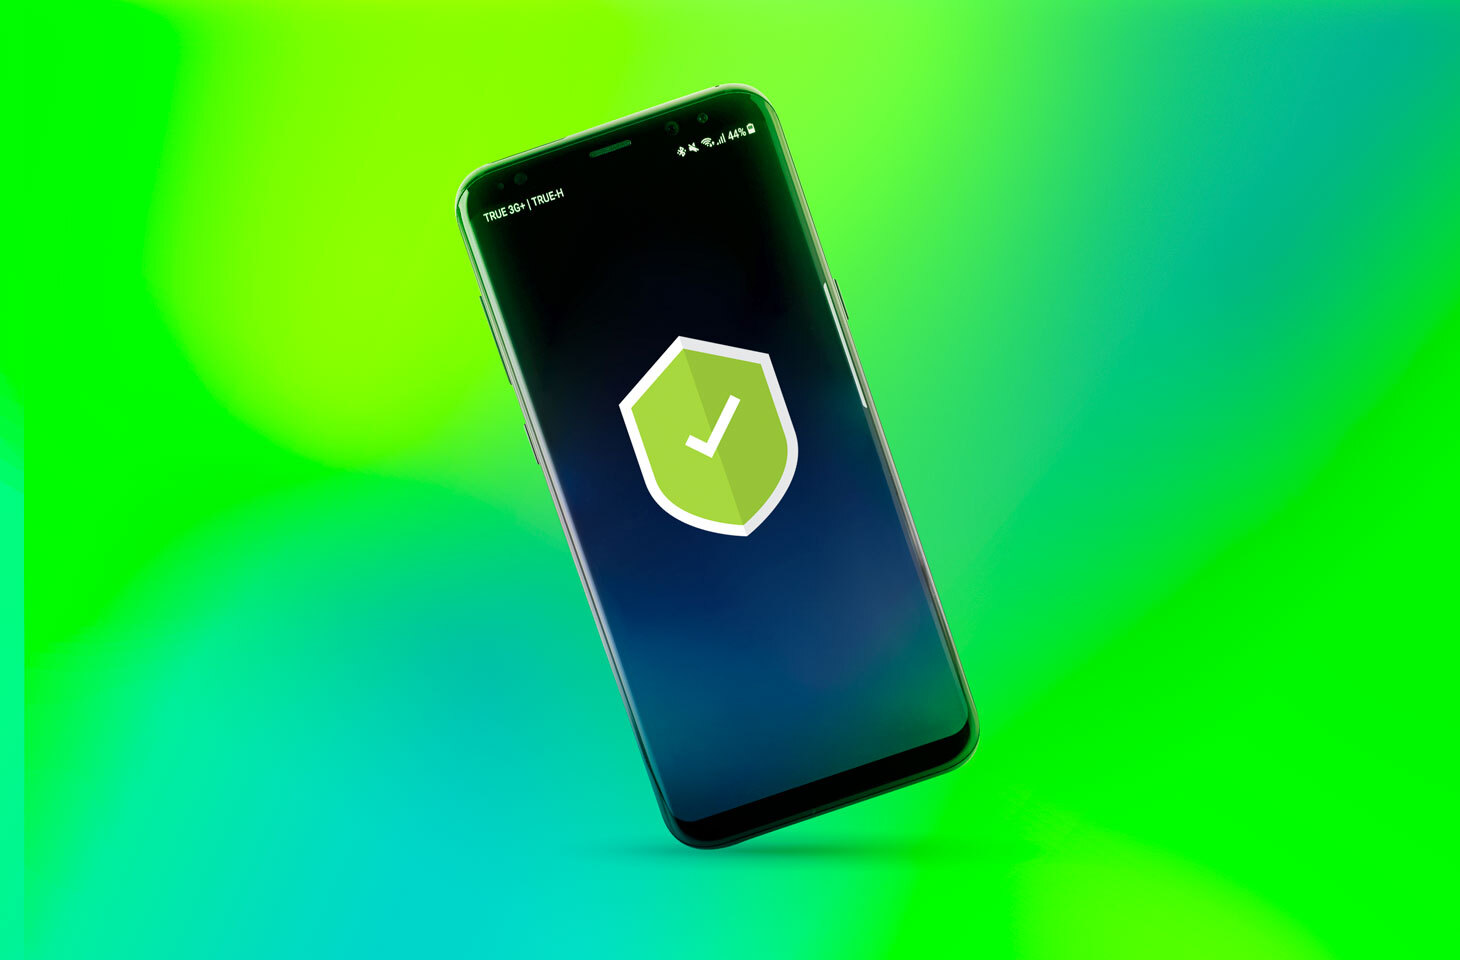 5個步驟檢查Android電話和資料安全